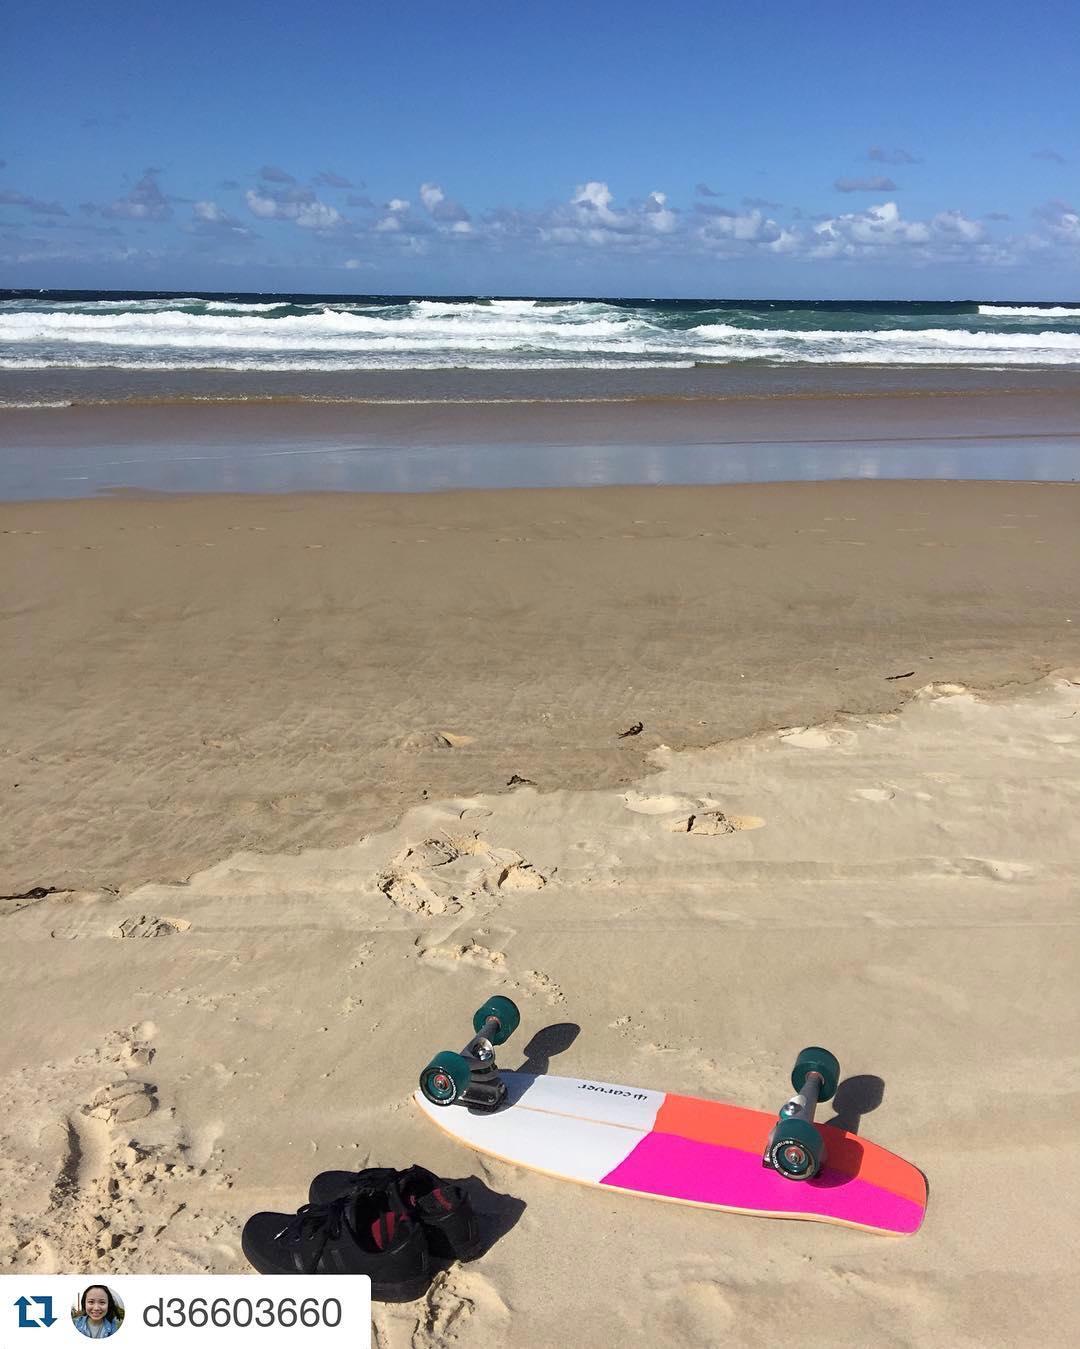 Surf check #Repost @d36603660 with @repostapp. ・・・ 好美的海跟好美的板子,又買了一塊板來跌倒。怎麼都跌不怕#carver